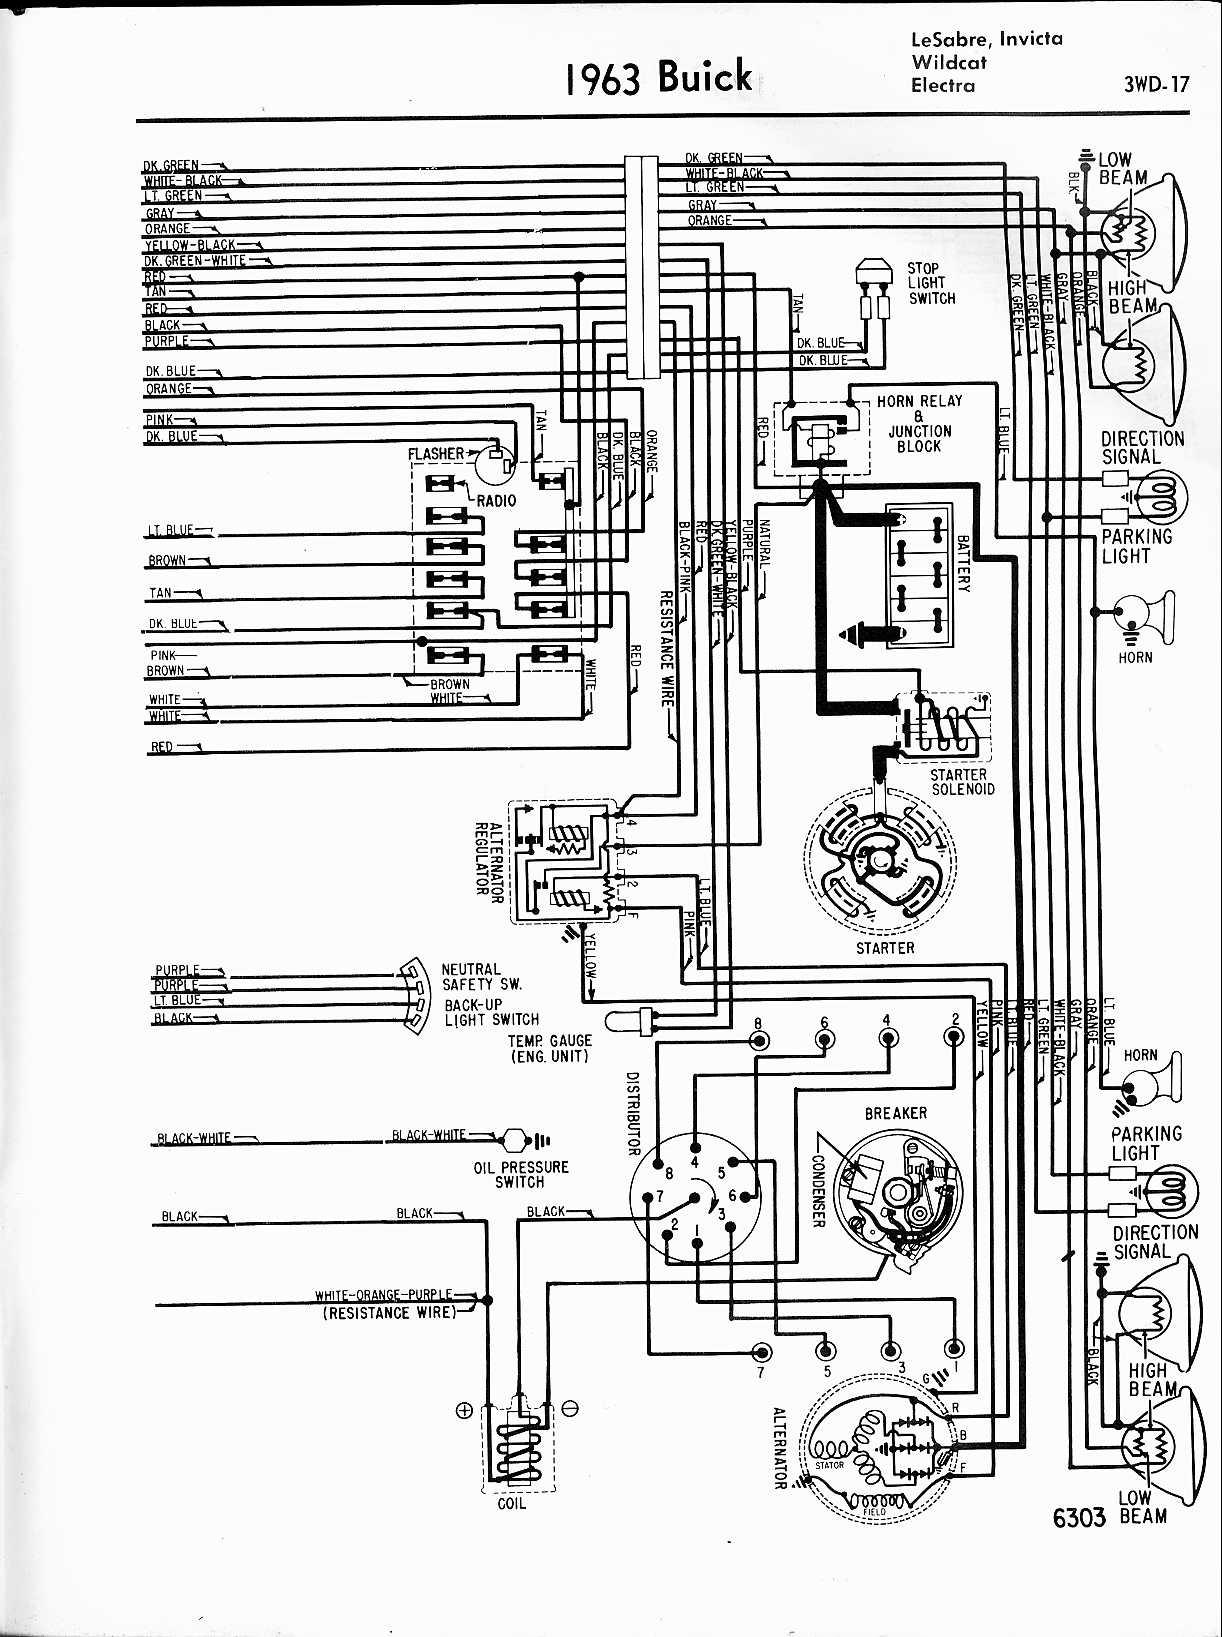 White River Rv Wiring Diagrams - Demag Pendant Switch Wiring Diagram for Wiring  Diagram Schematics | White River Rv Wiring Diagrams |  | Wiring Diagram Schematics